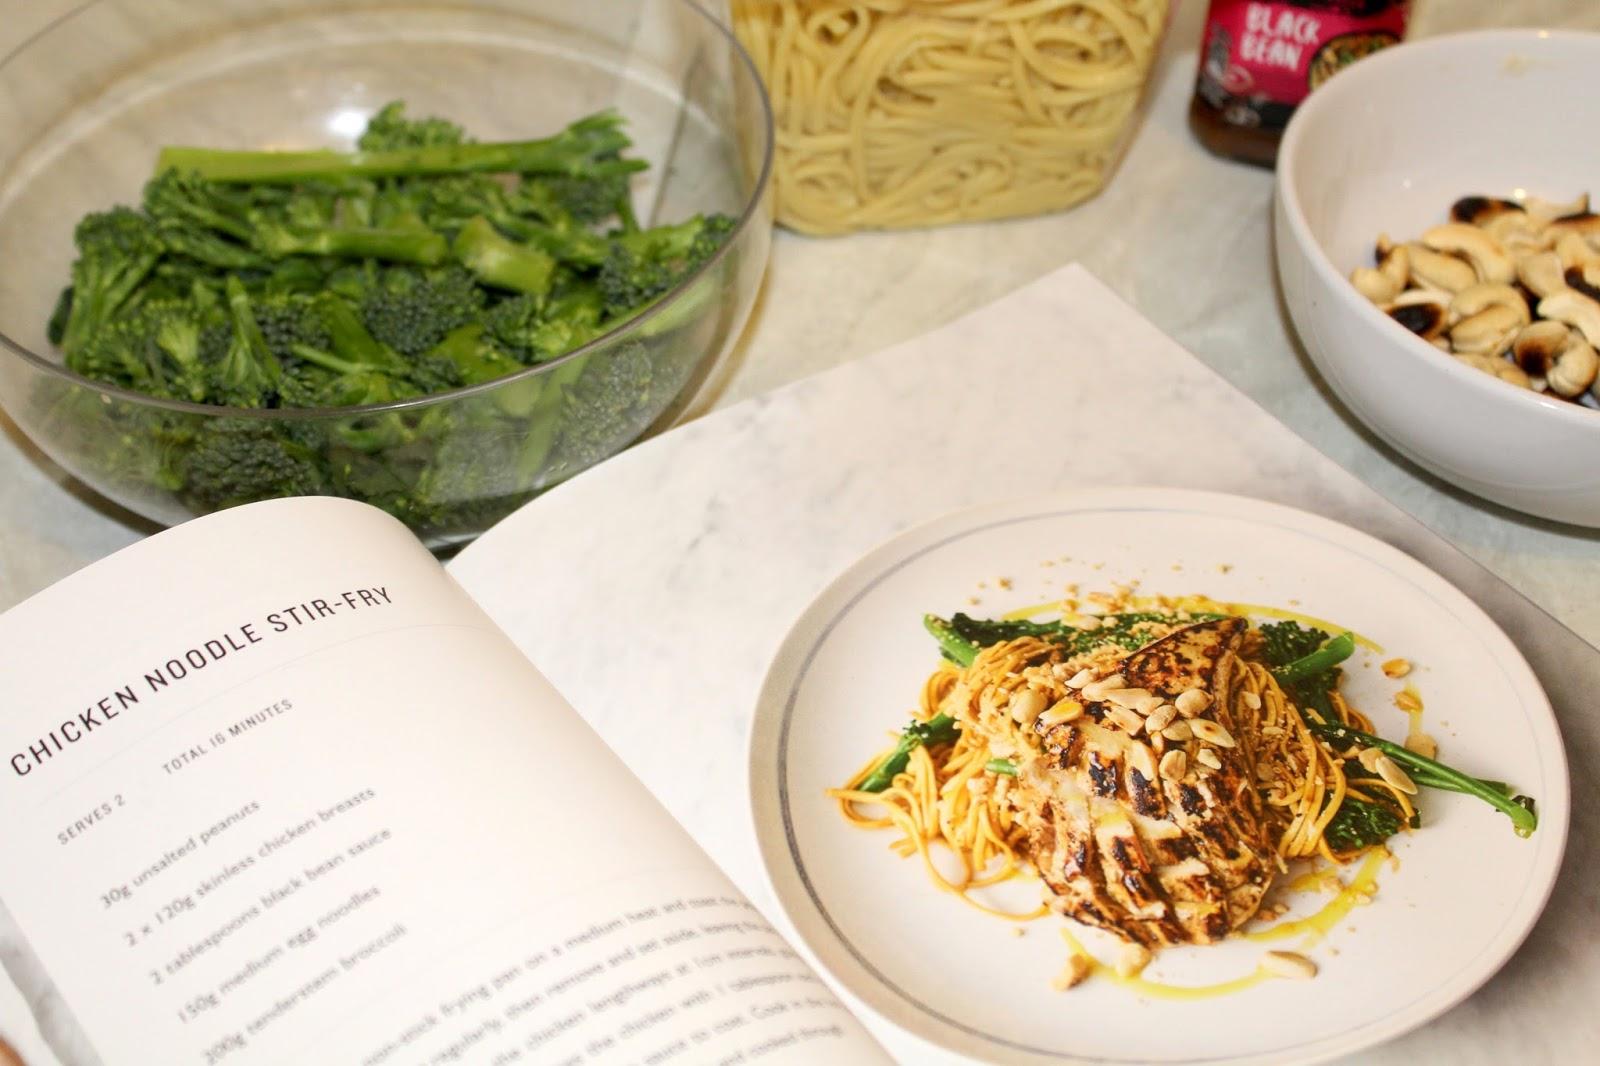 issybellefox jamie Oliver 5 Ingredients - Quick & Easy Food